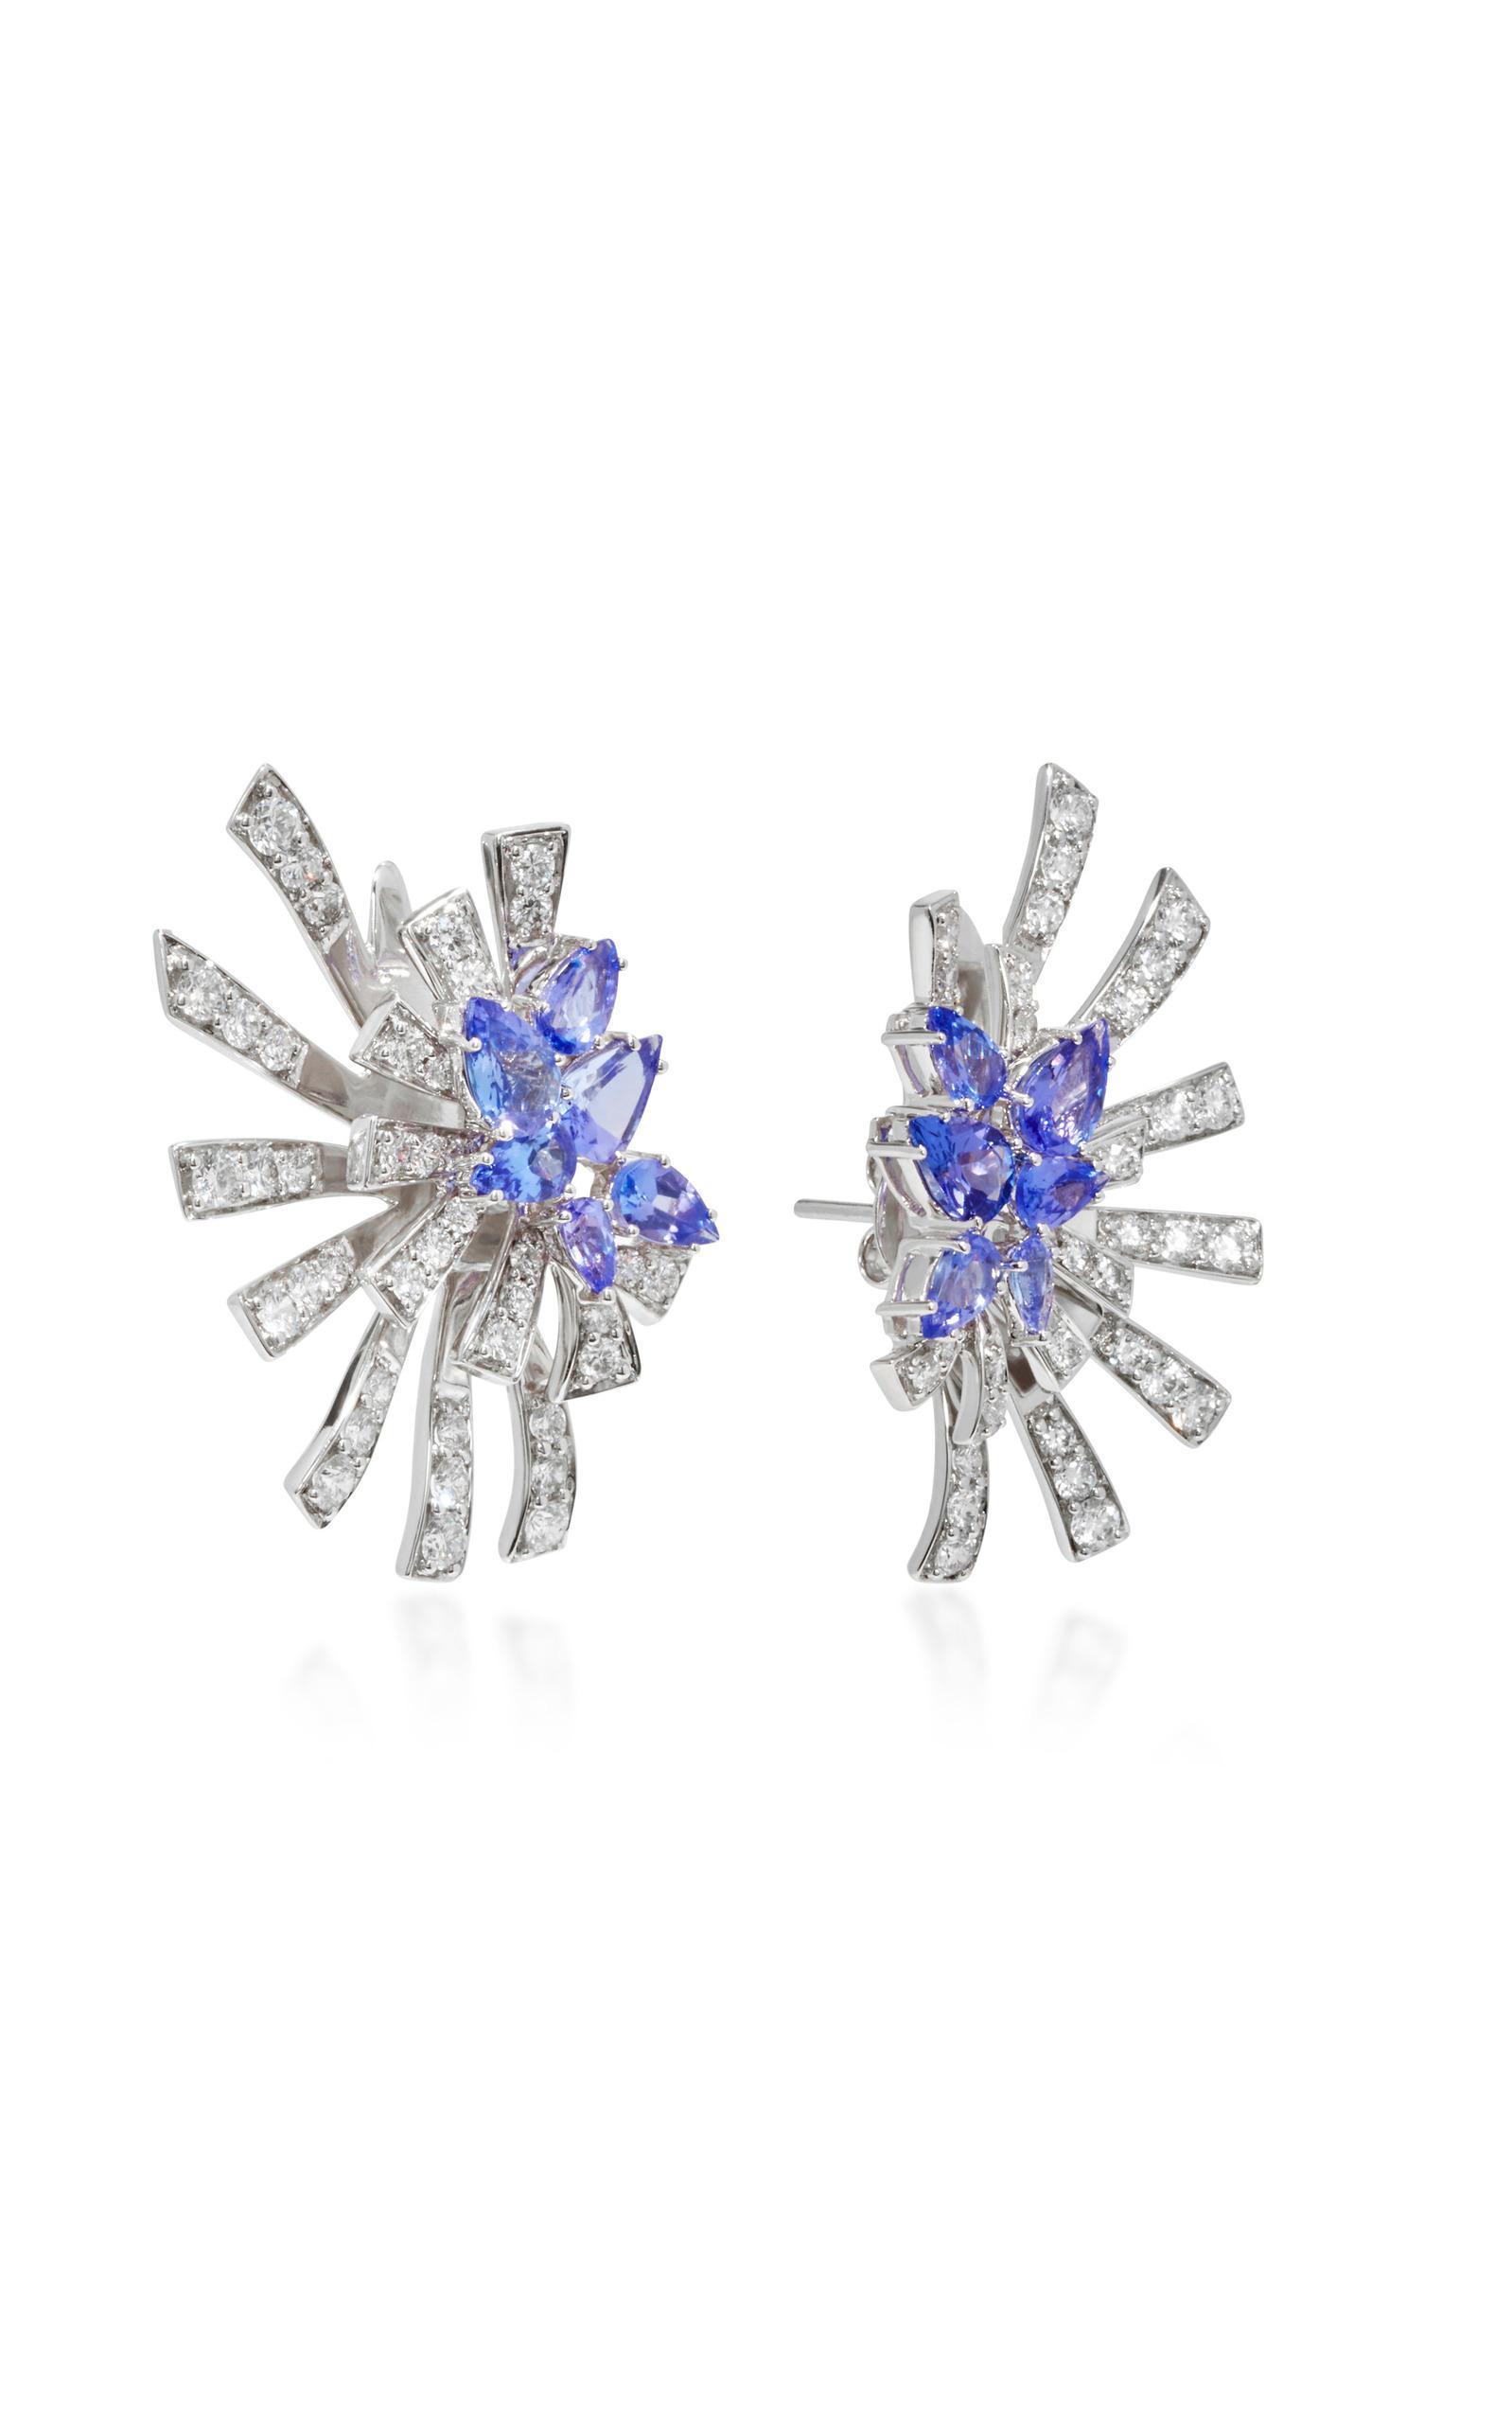 Mirage 18K White Gold Diamond and Tanzanite Earrings Hueb IzGxrQ86